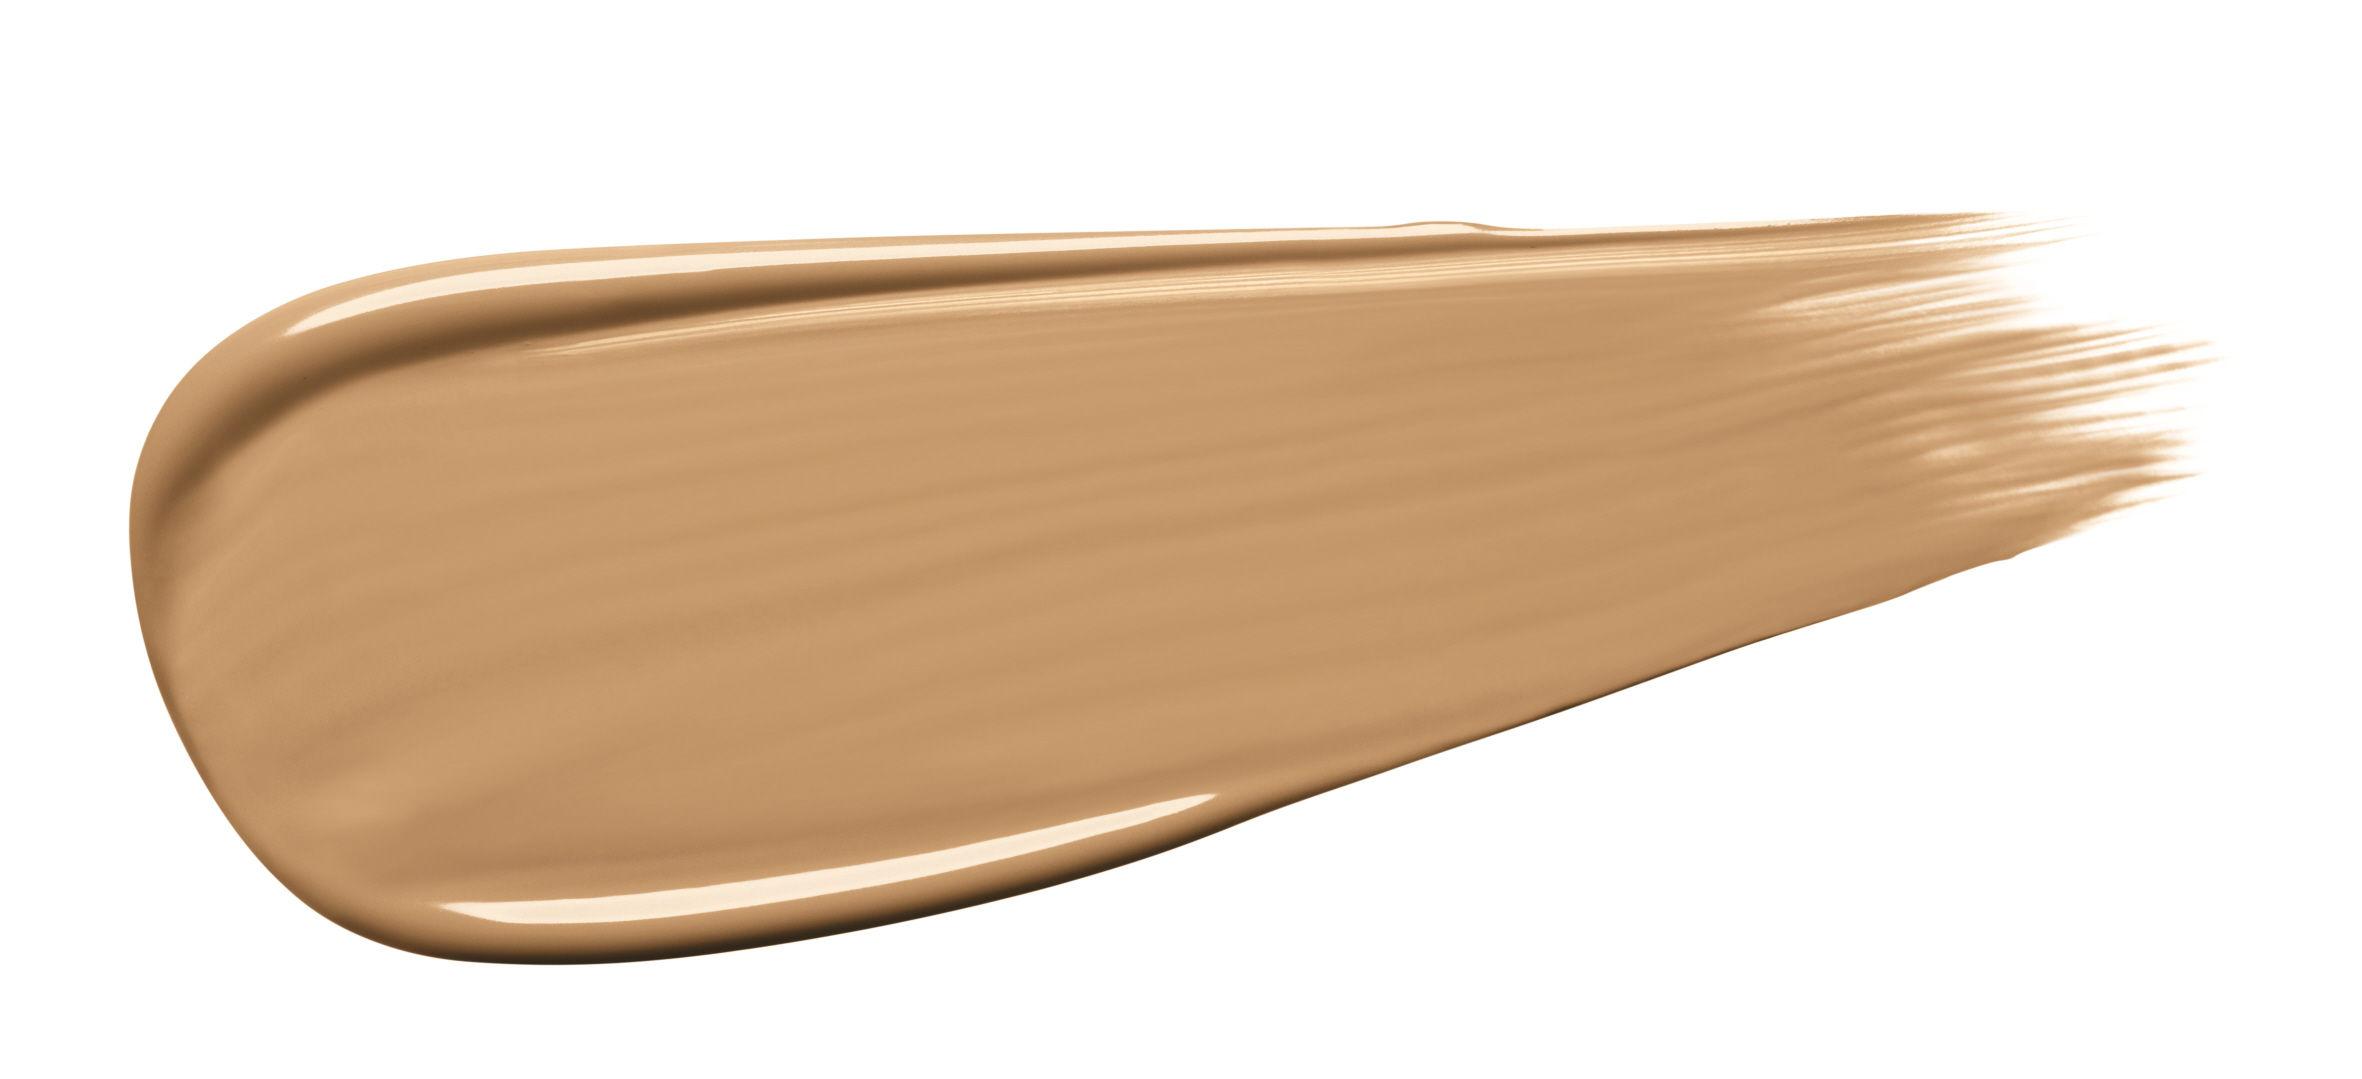 Y328 Sand Nude